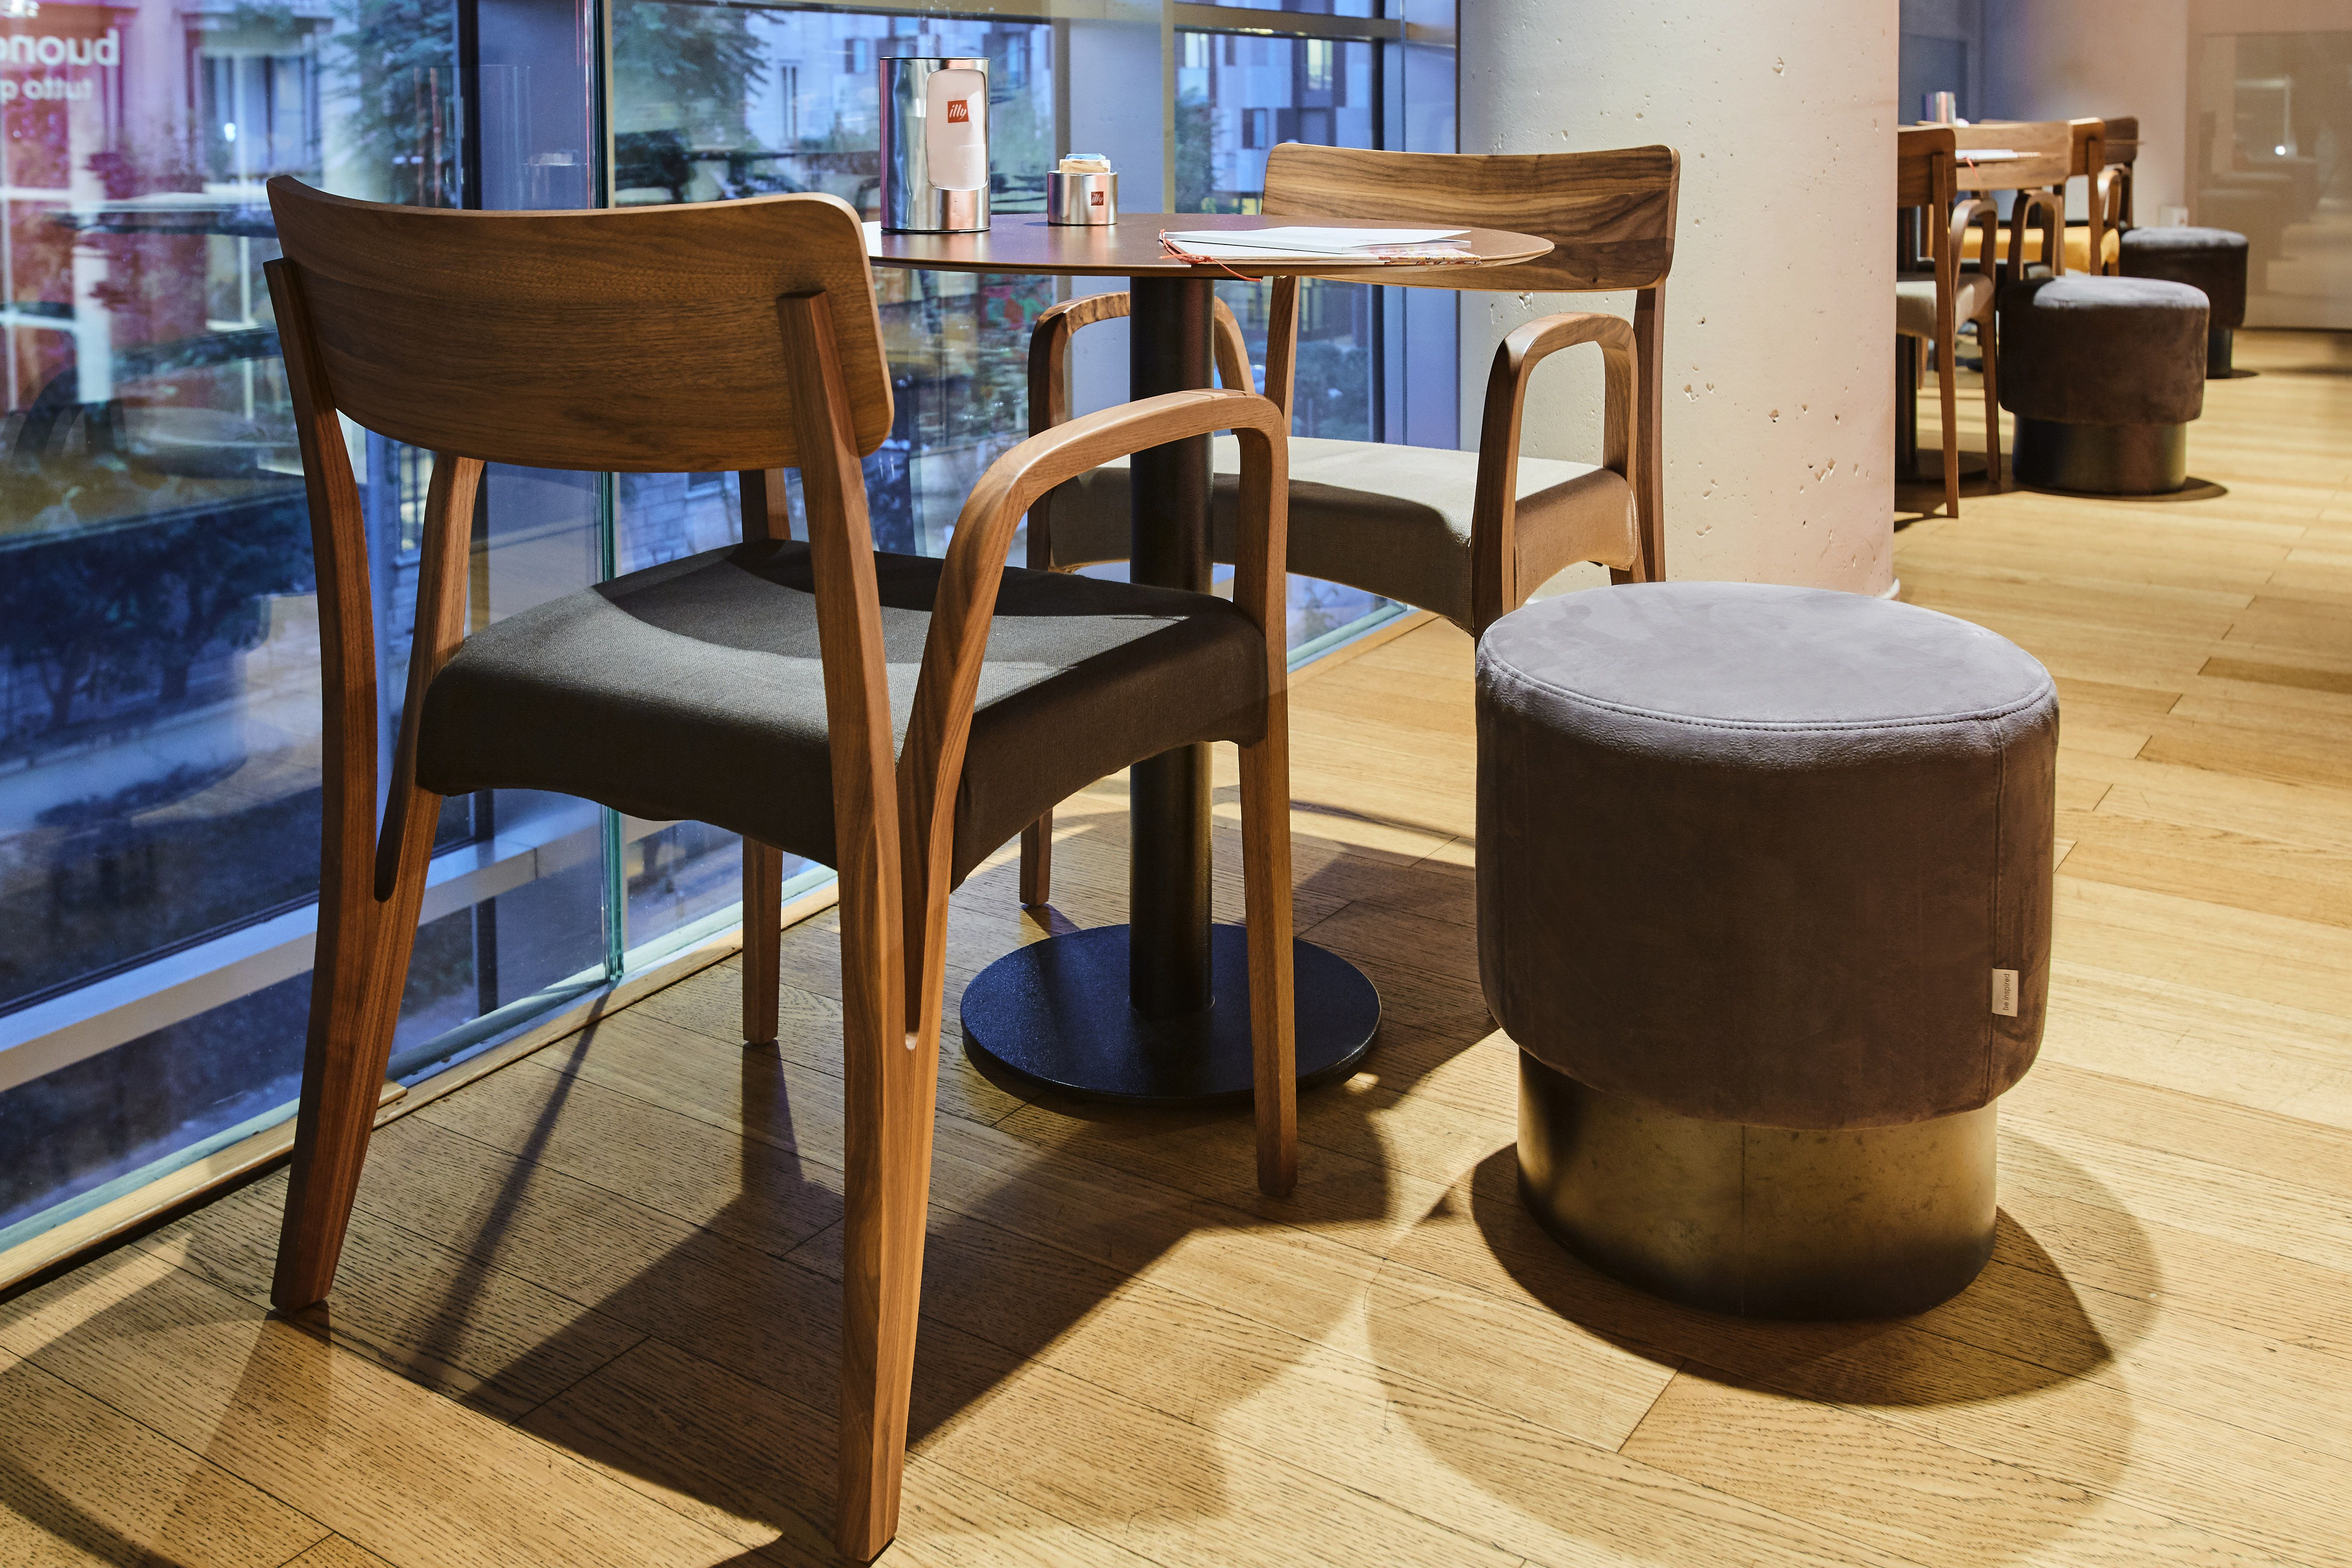 Ristorante #mobili #arredamento #tavoli #sedie #sgabelli #divani